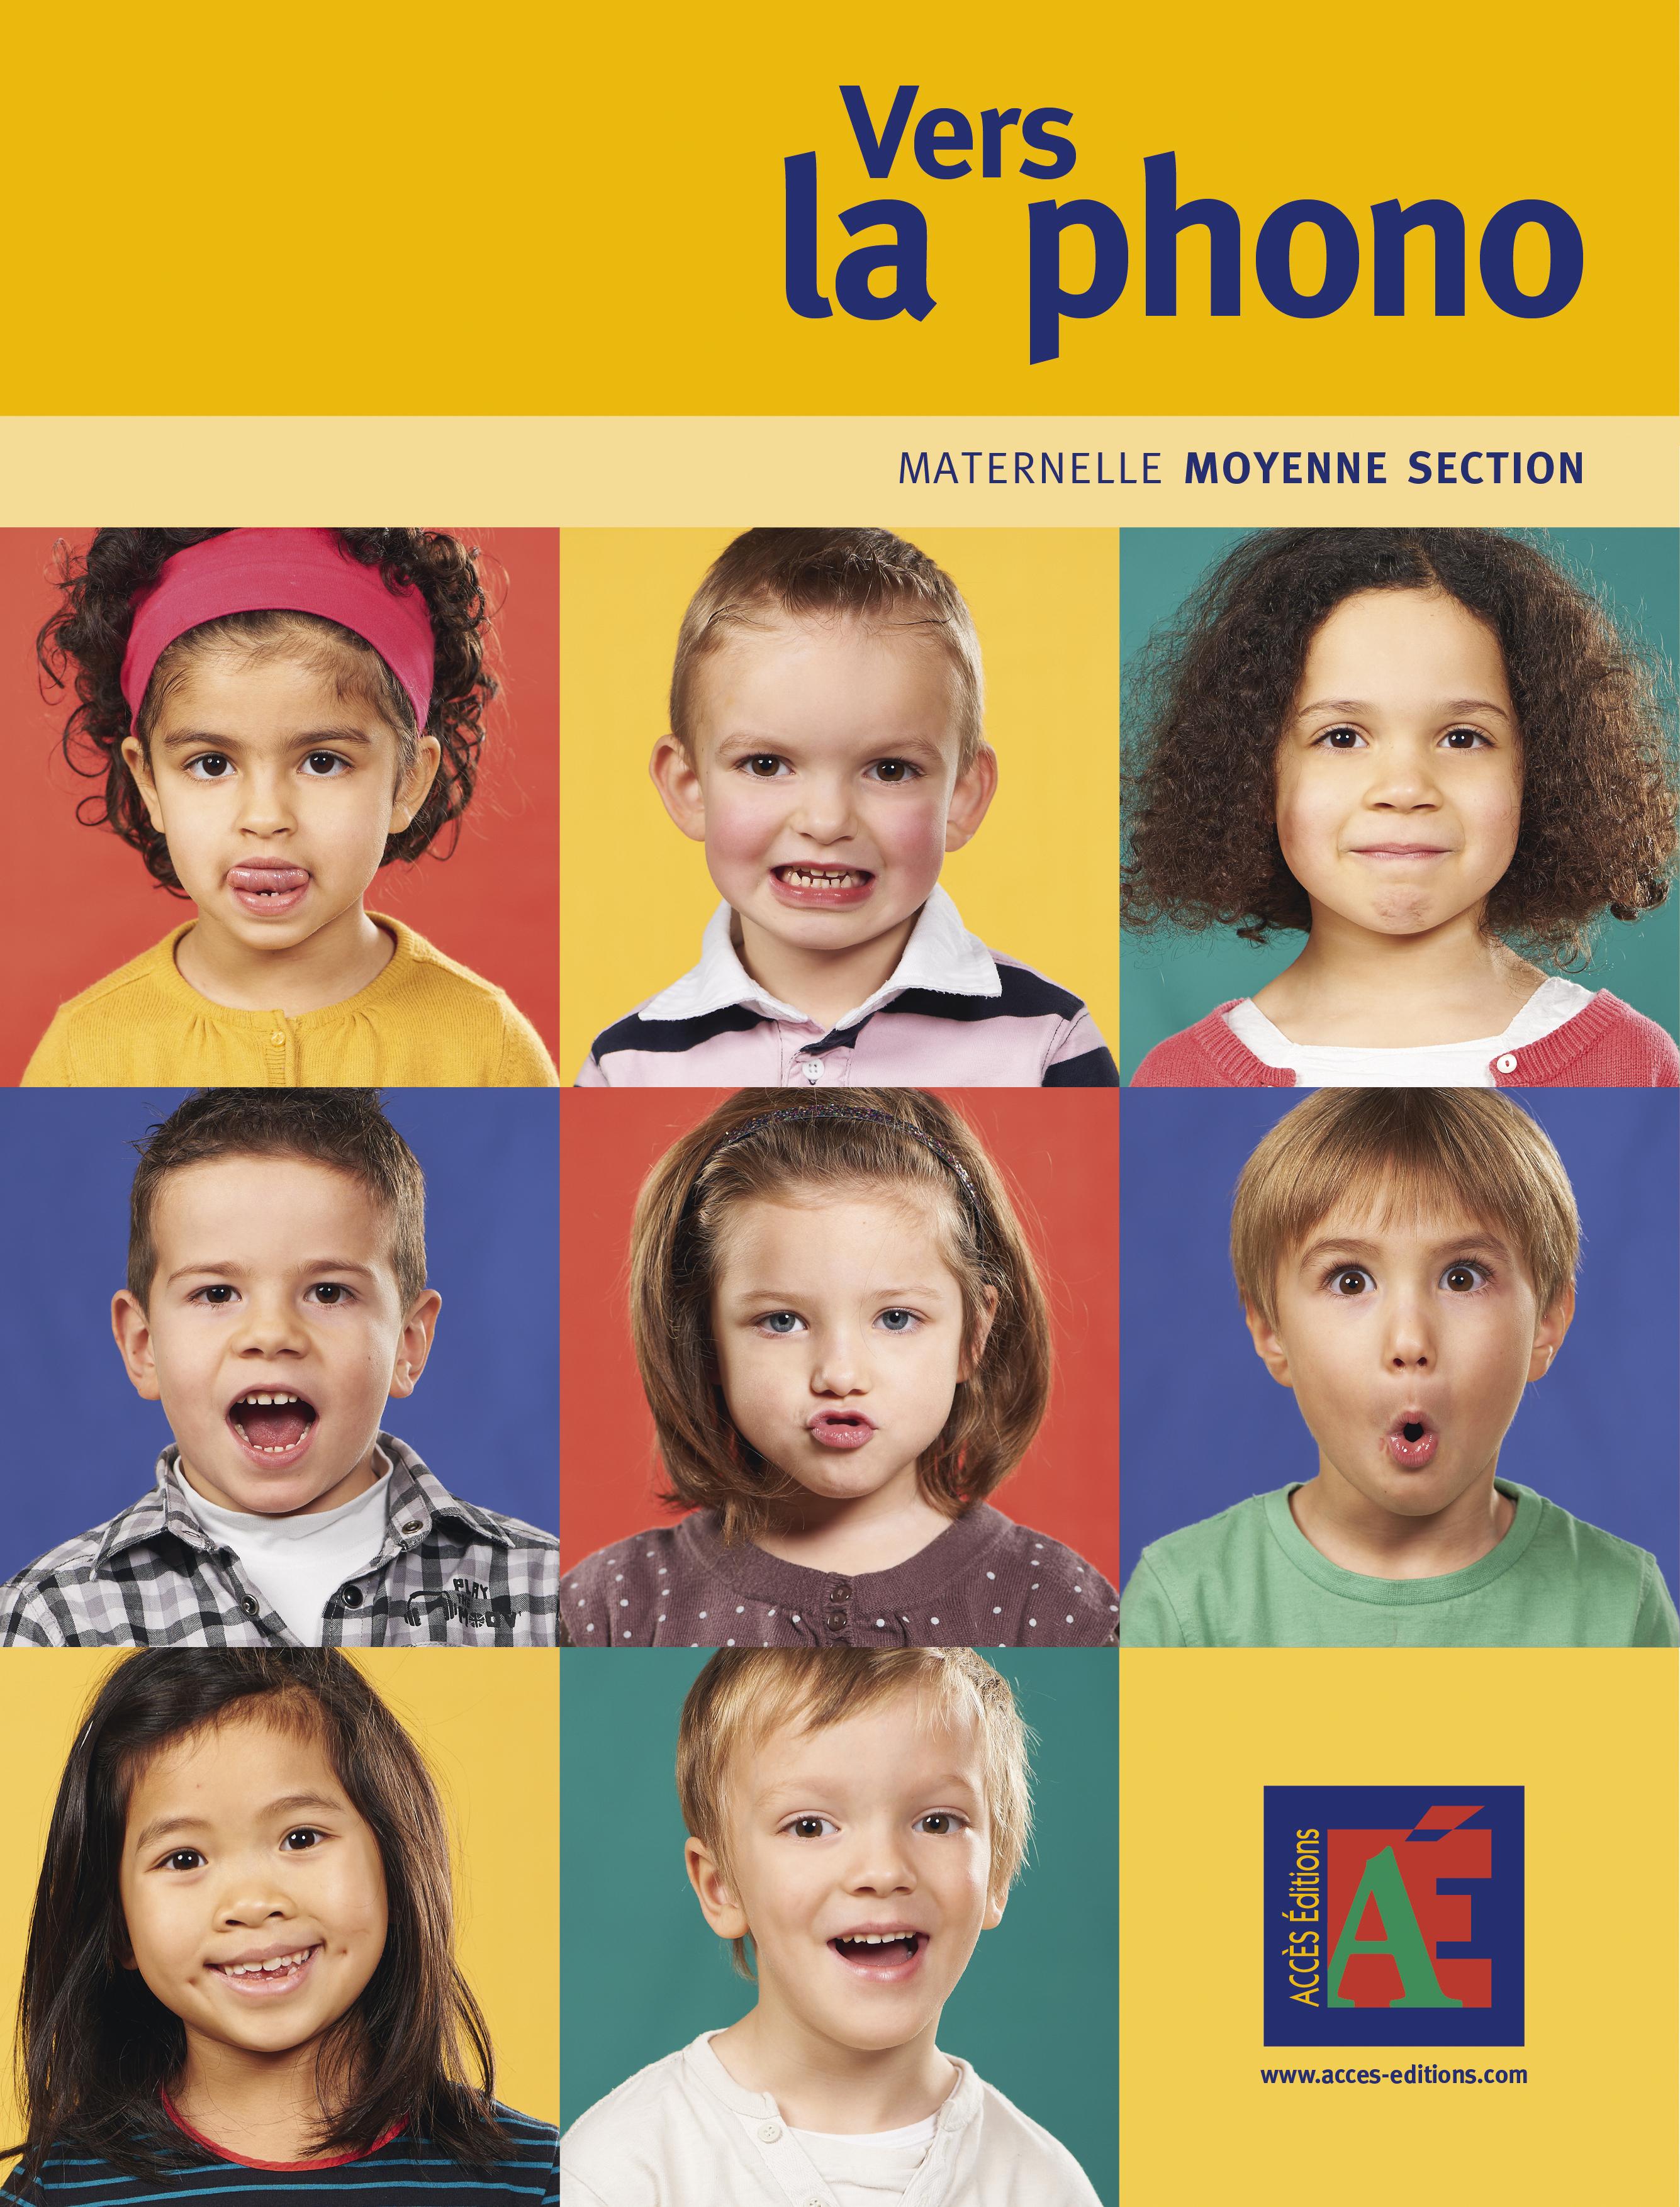 VERS LA PHONO MOYENNE SECTION